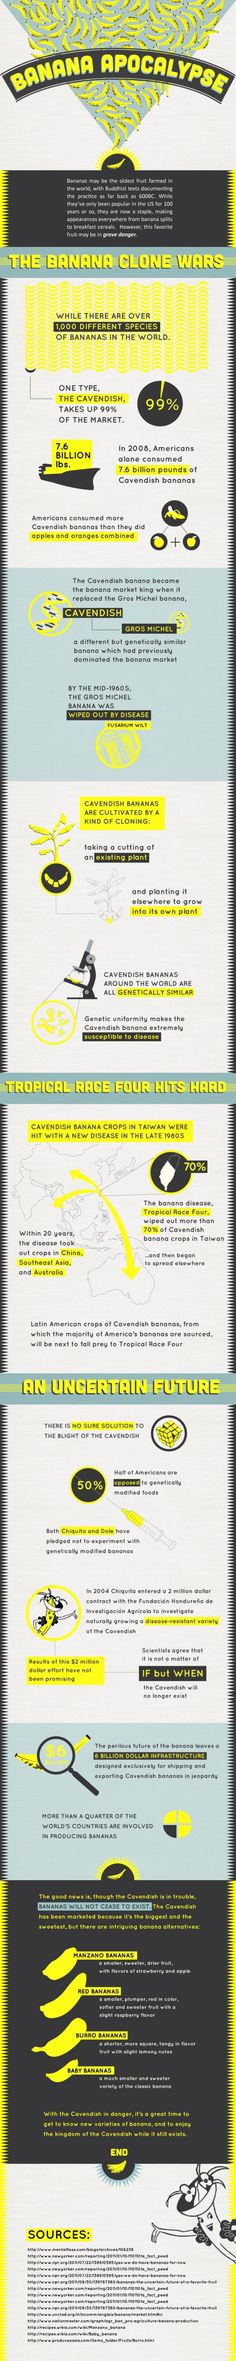 Banana Apocalypse #Infographic